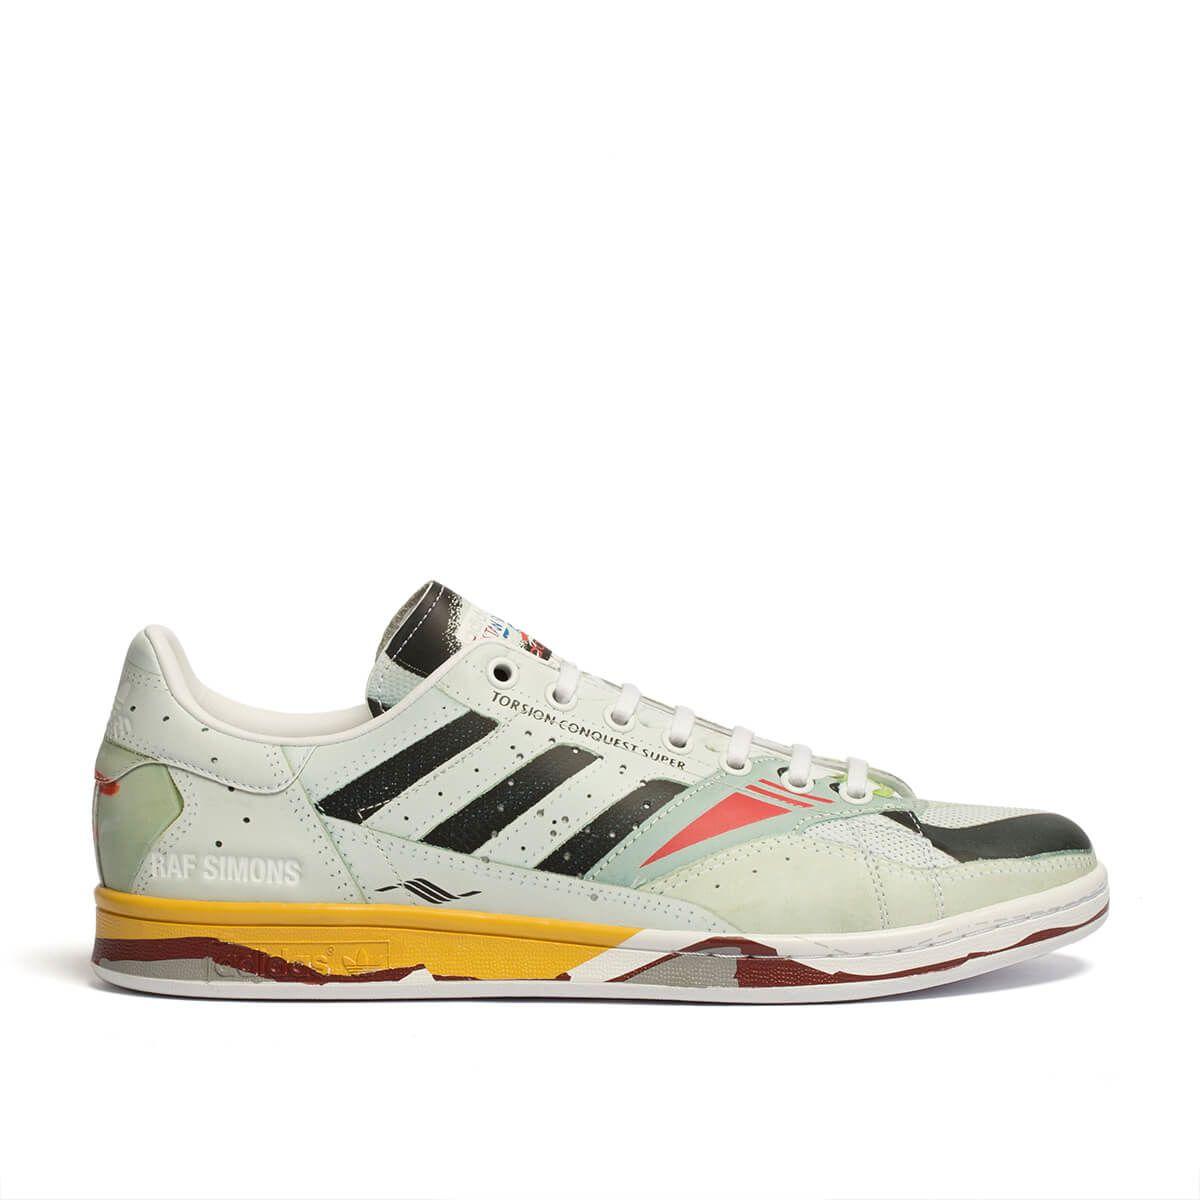 3d9d49068 Adidas By Raf Simons Adidas By Raf Simons Torsion Stan Sneakers ...